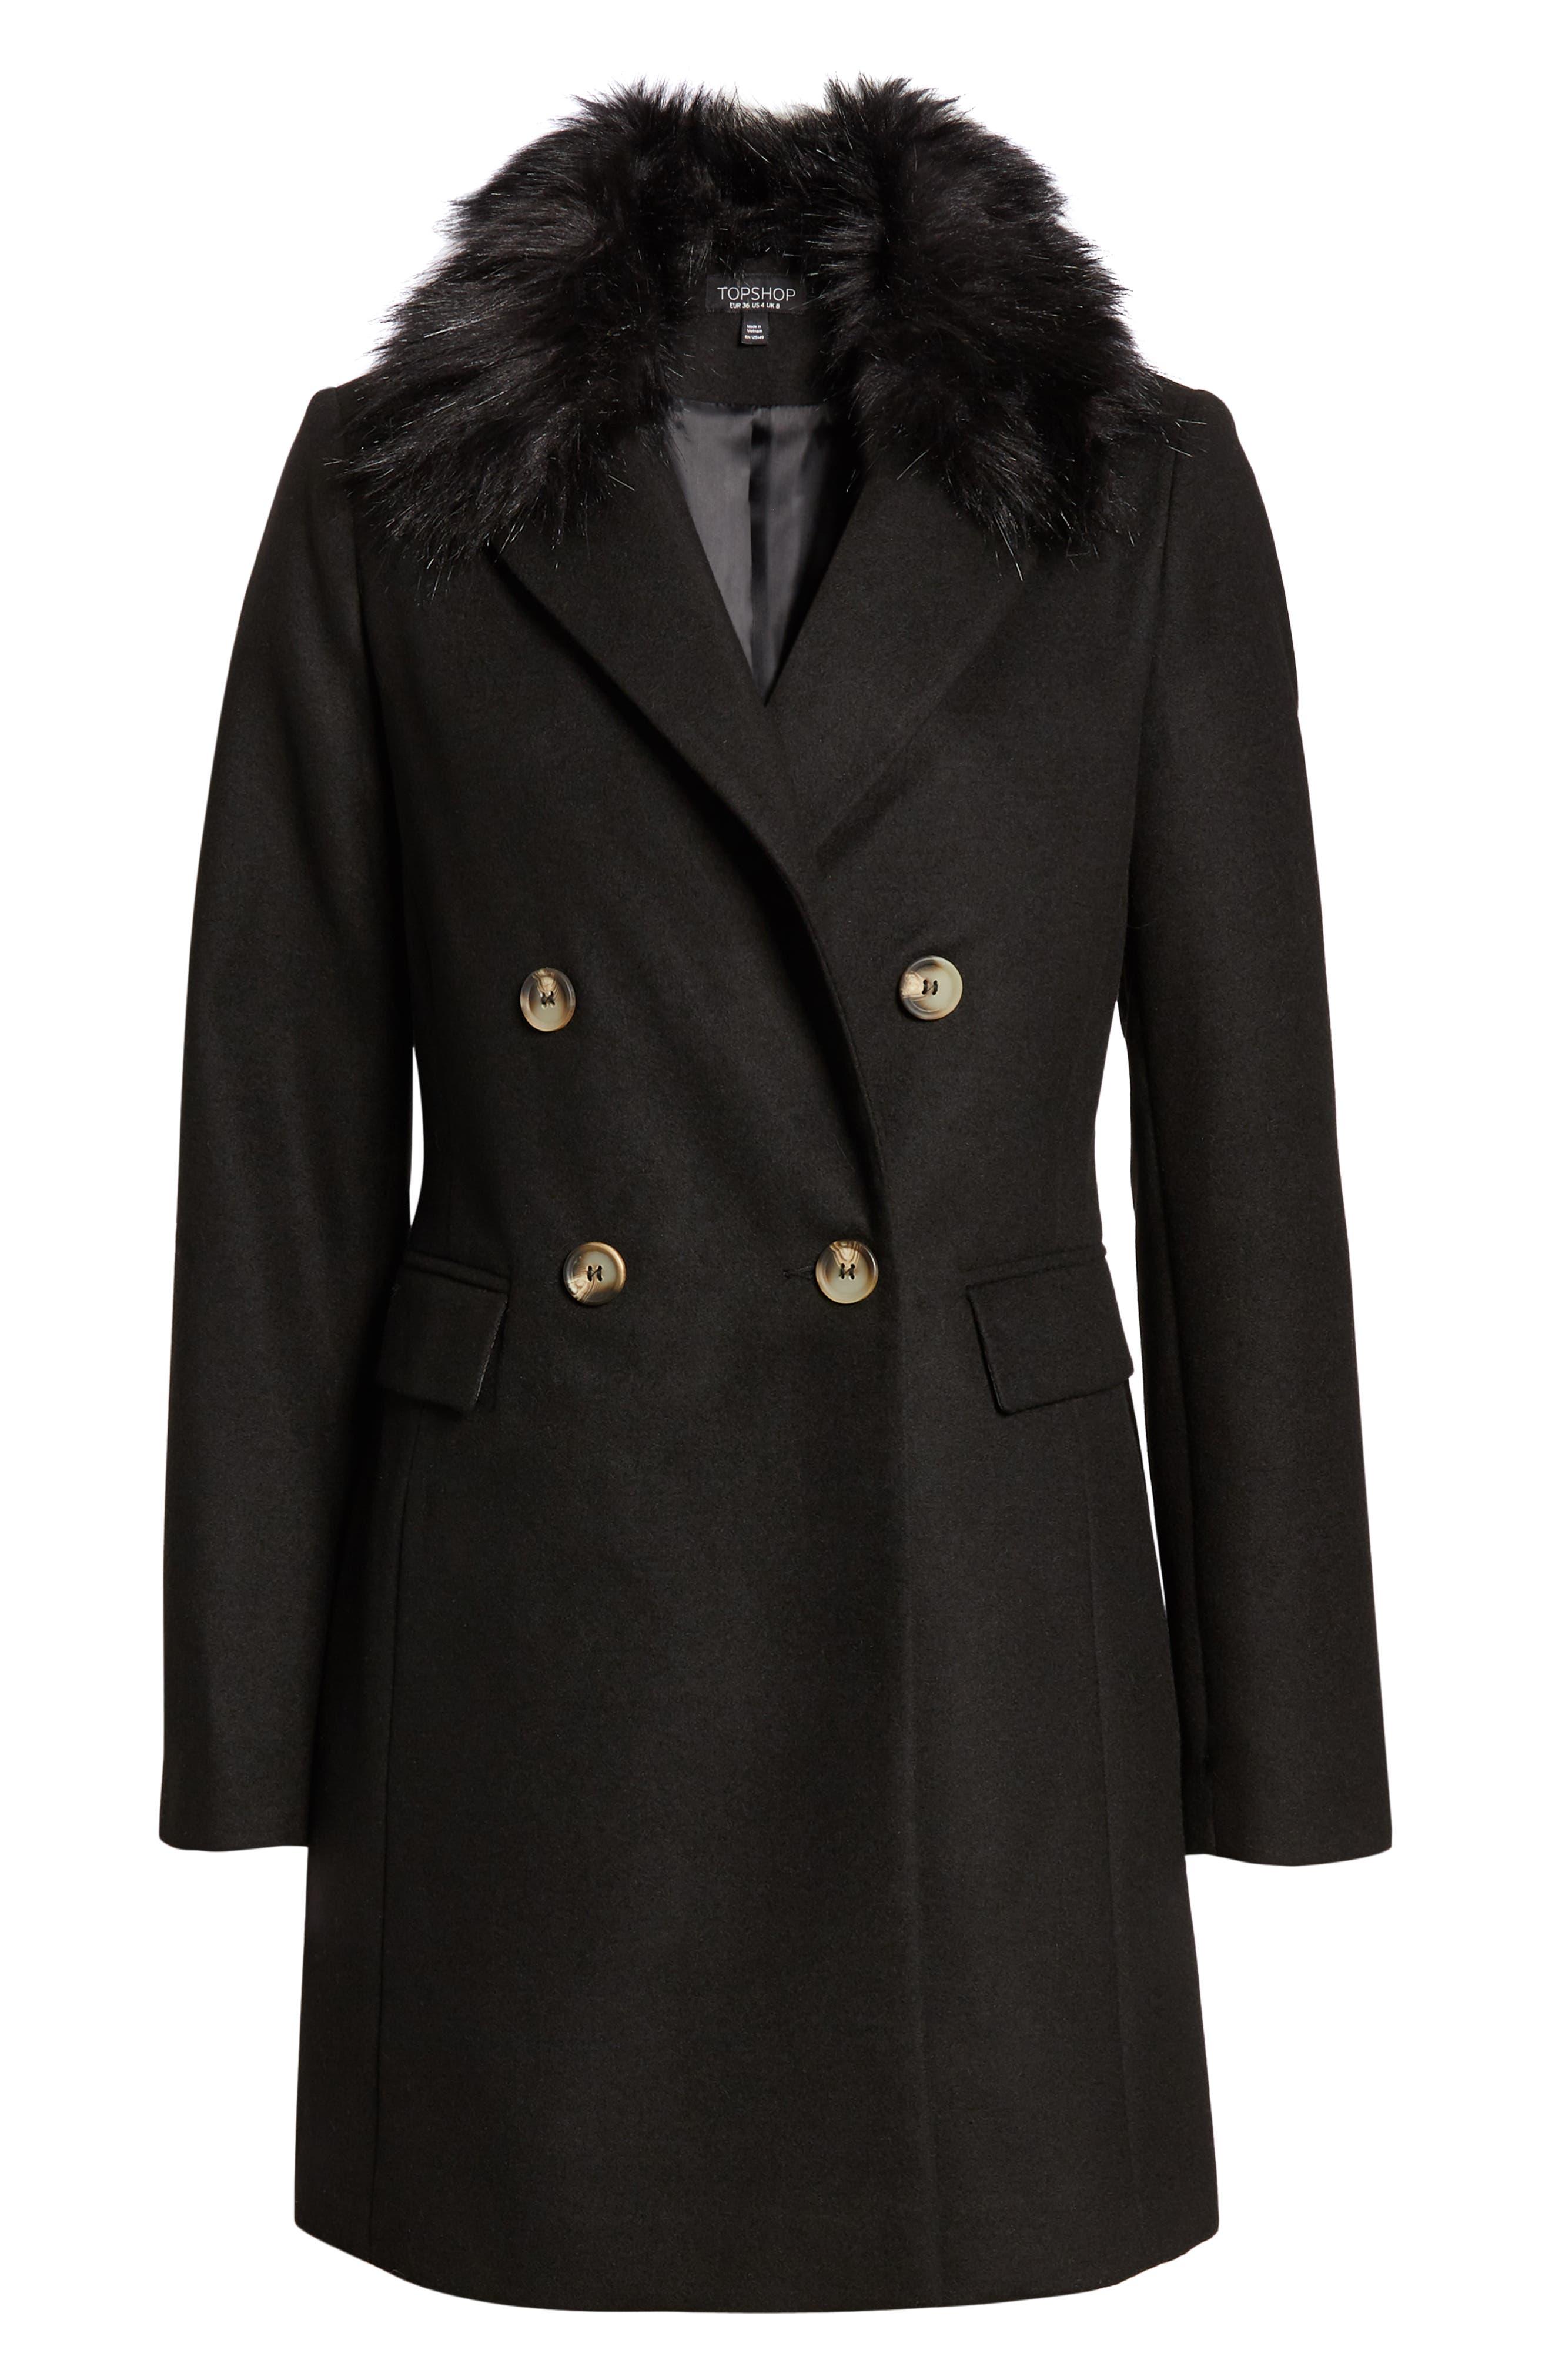 Naomi Faux Fur Collar Coat,                             Alternate thumbnail 3, color,                             BLACK